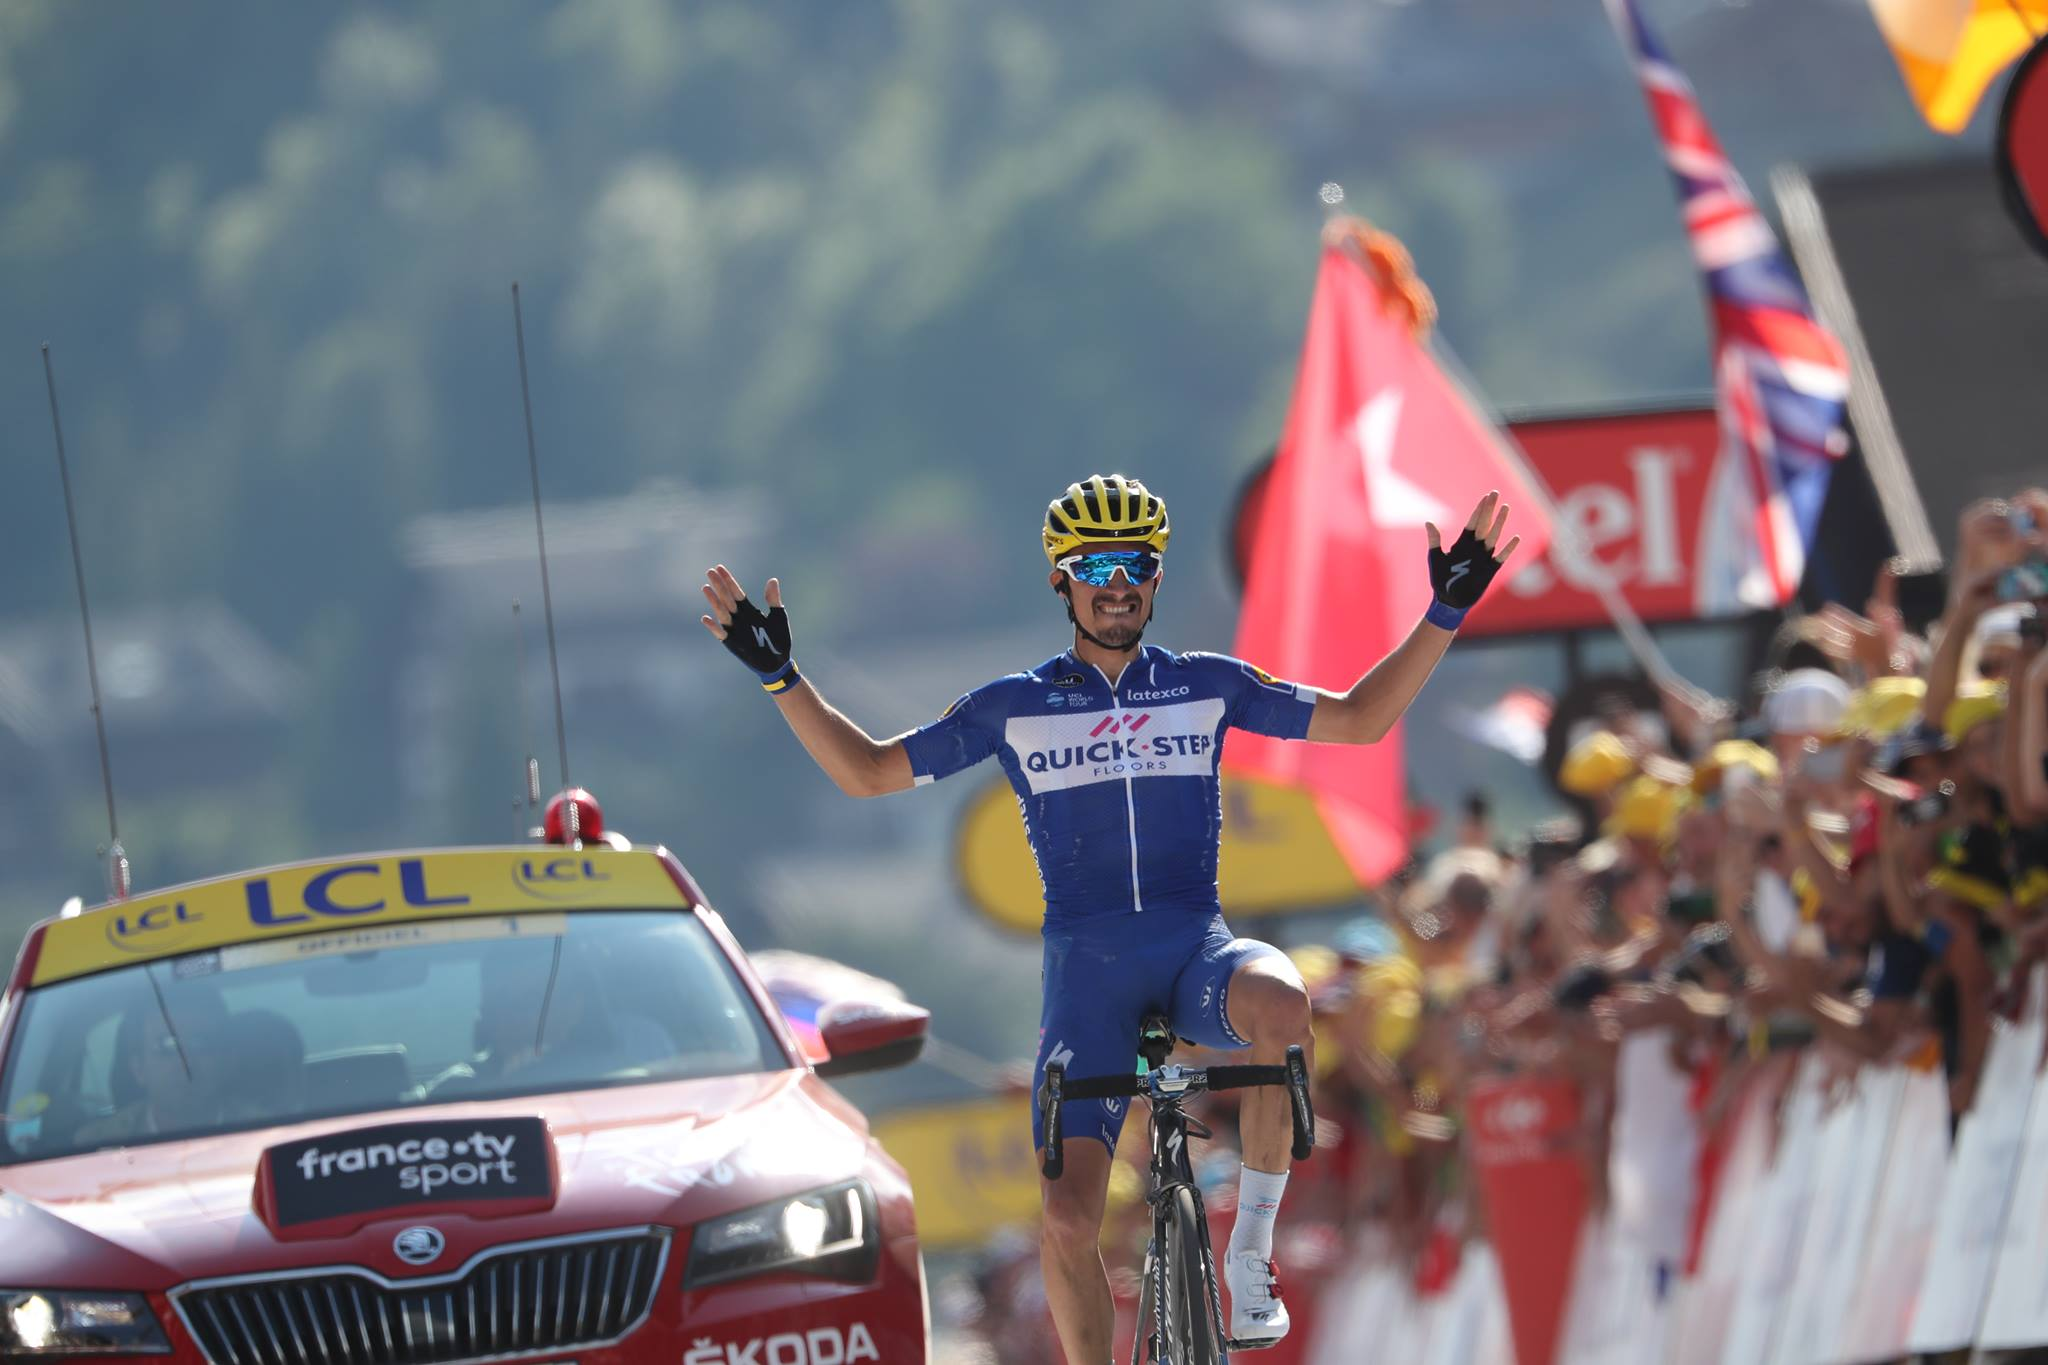 Julian Alaphilippe vince la decima tappa del Tour de France 2018